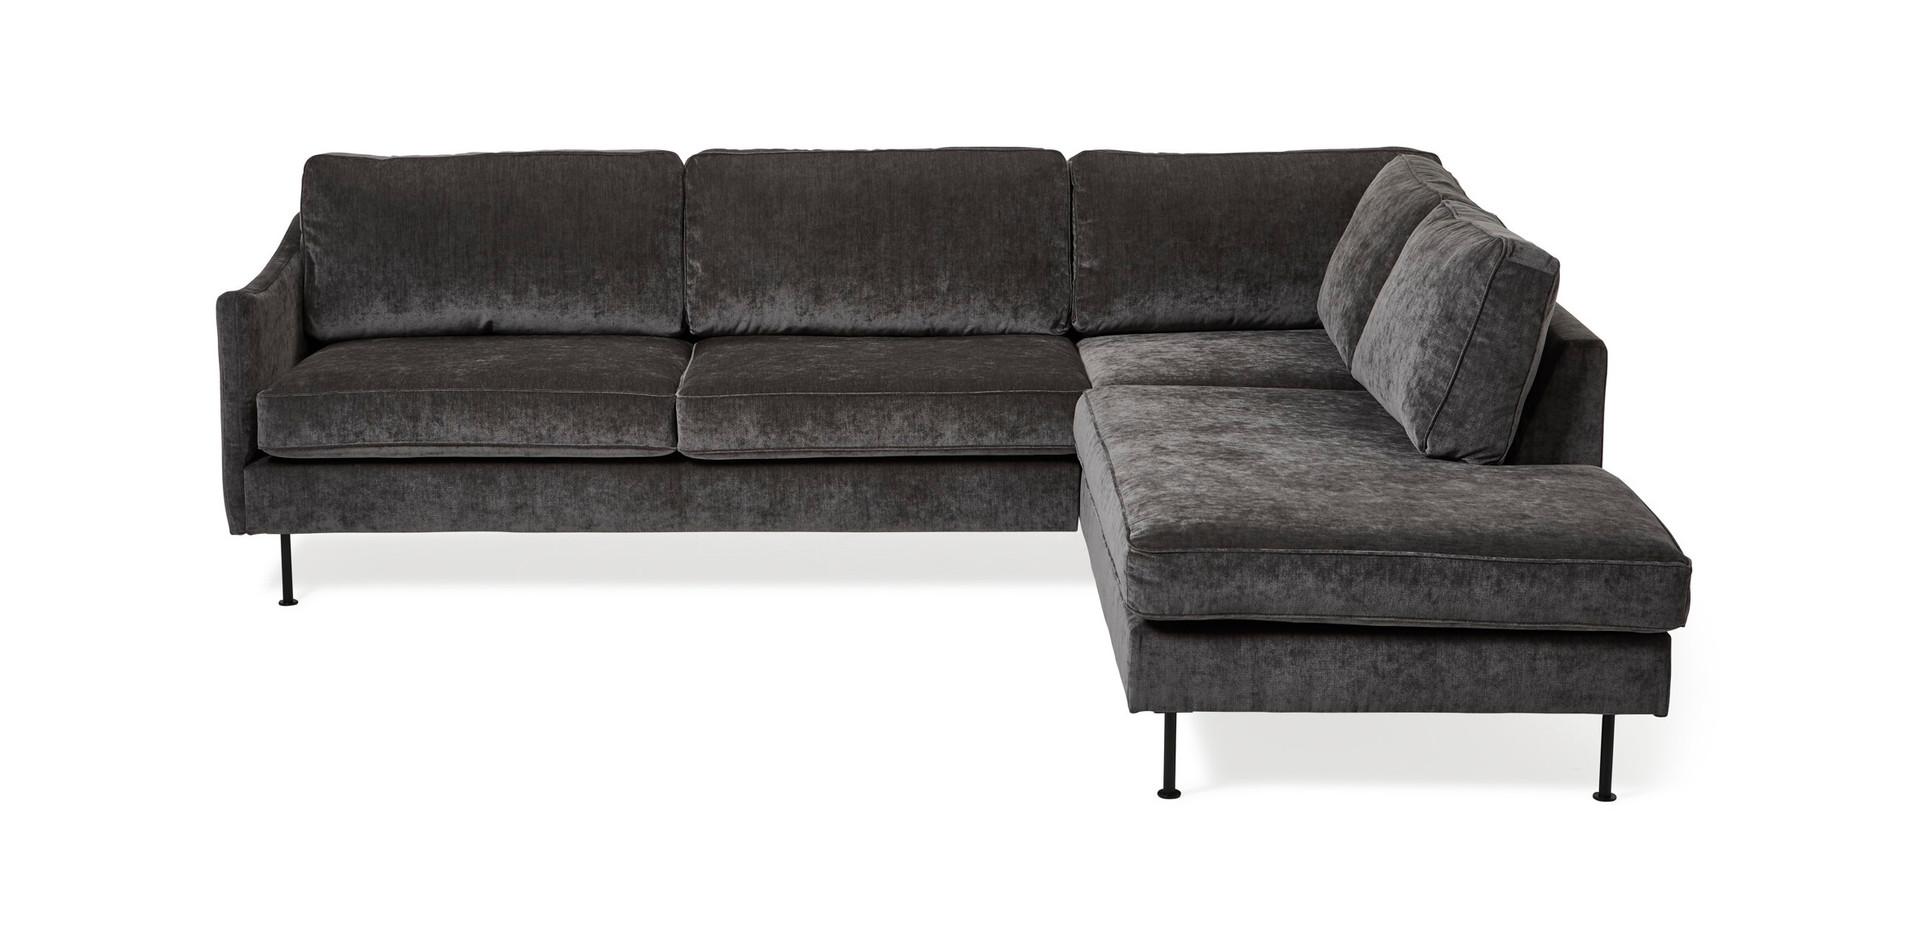 Savona 2.5D Eros dark grey